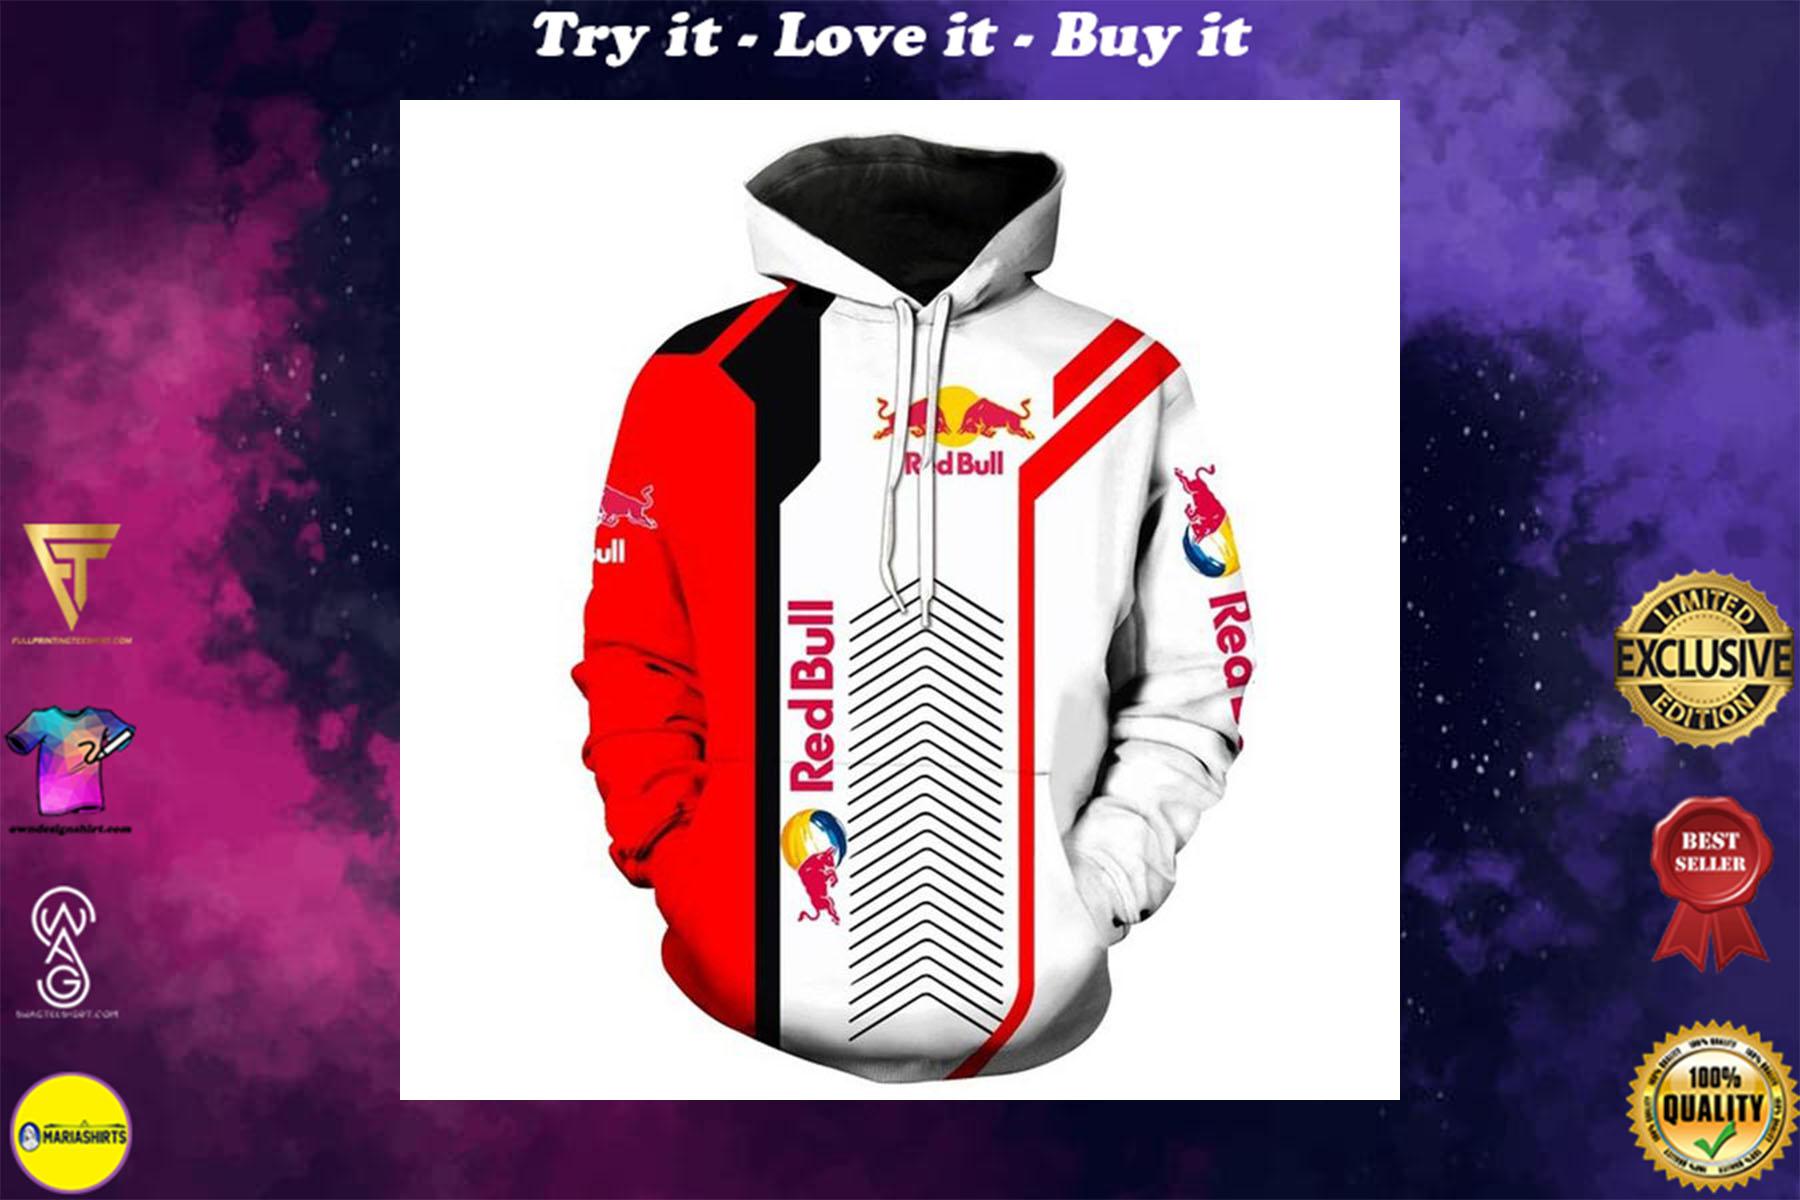 [special edition] red bull sports car motorcycles full printing shirt - maria